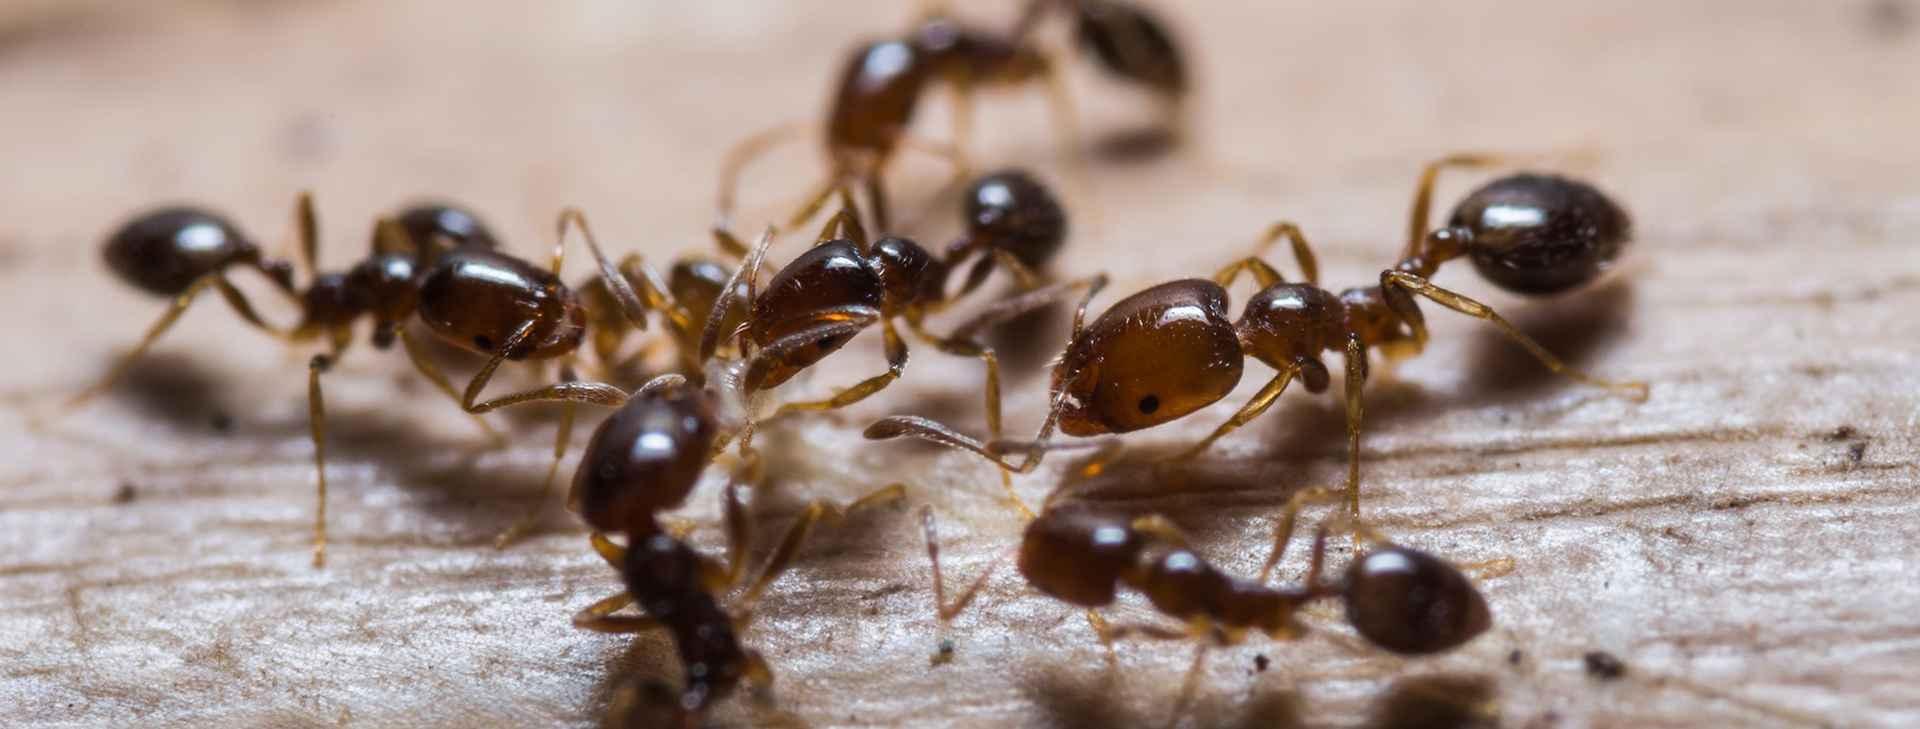 Master Pest Control Melbourne (@masterpestcontrol) Cover Image